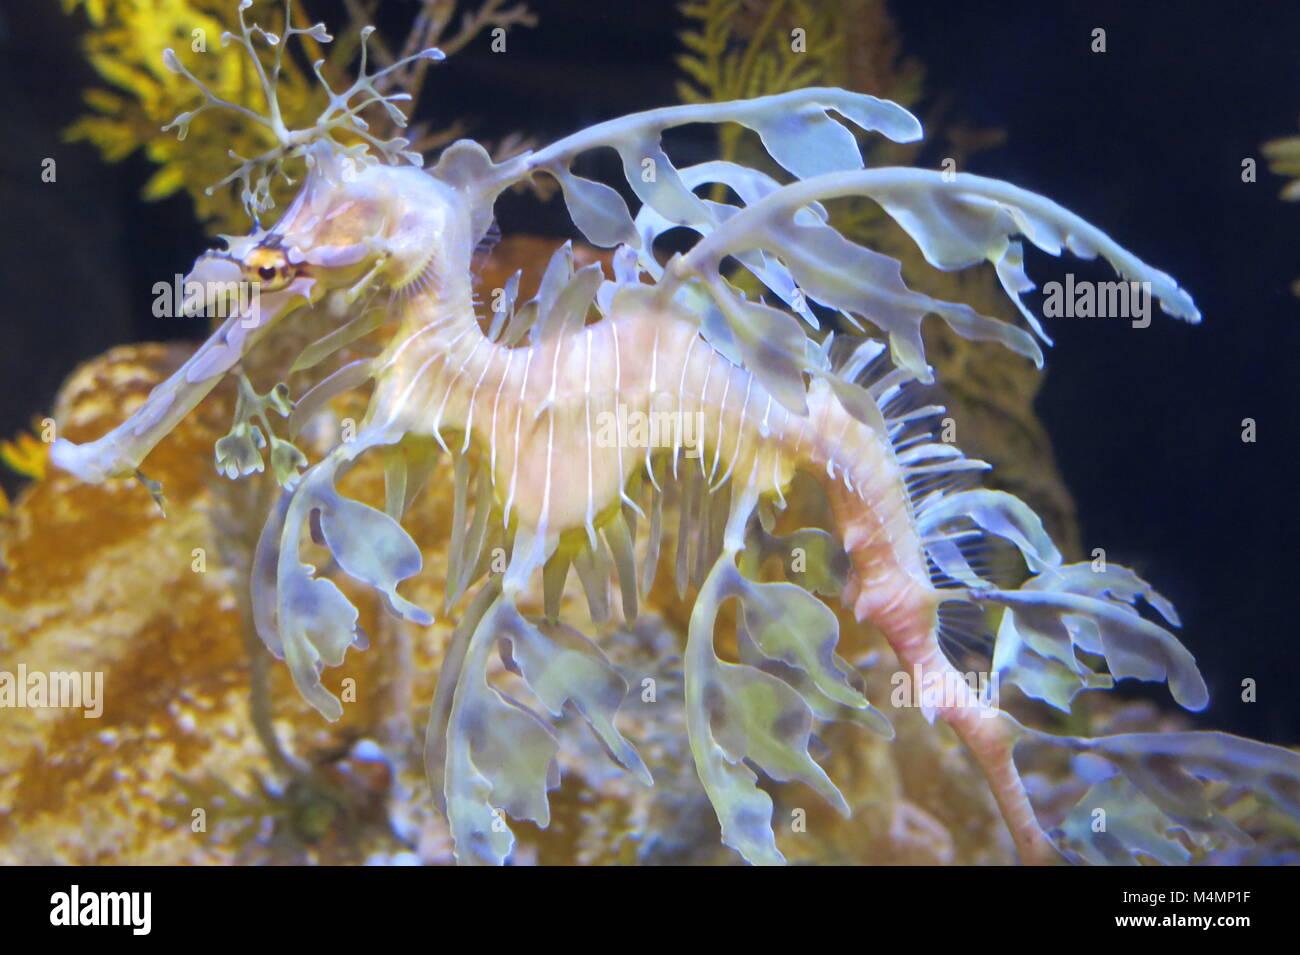 Close up of a leafy seadragon at Birch Aquarium - Stock Image